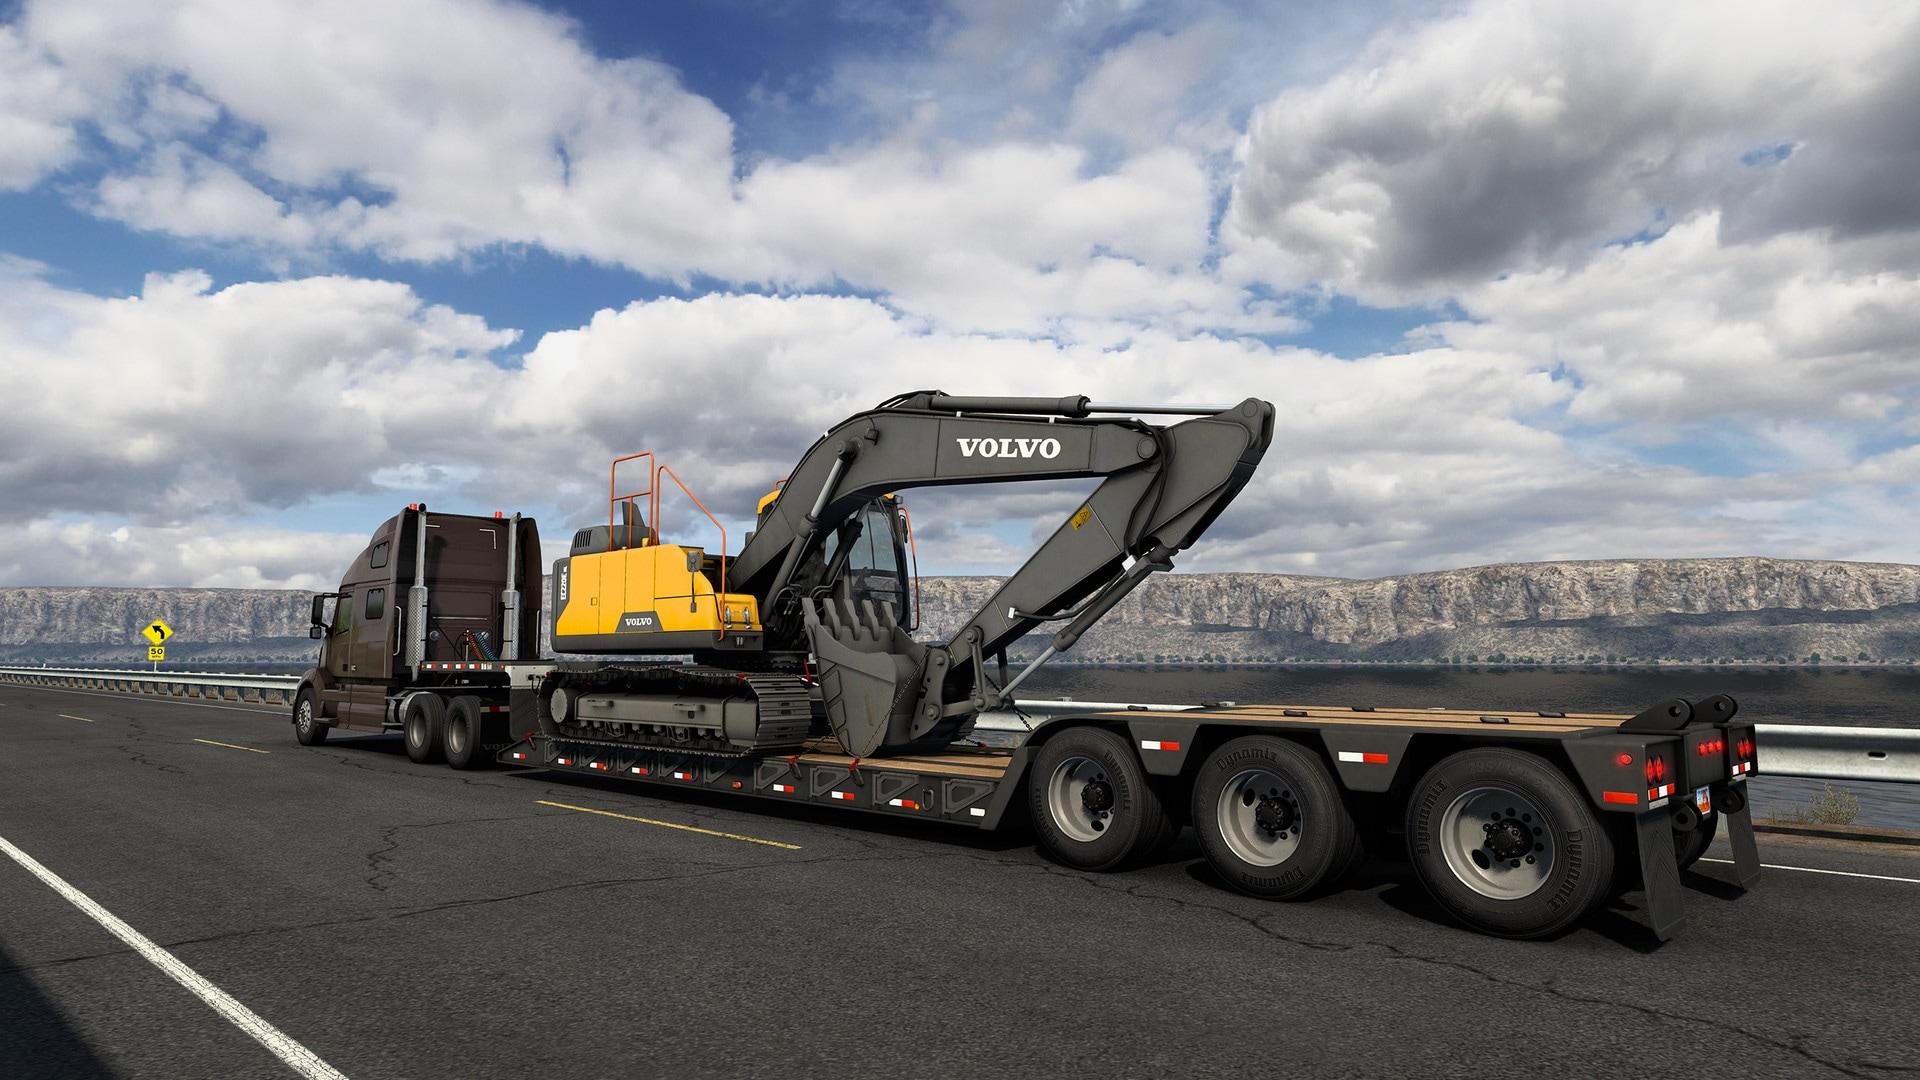 American Truck Simulator - Volvo Construction Equipment (PC) - Steam Gift - GLOBAL - 4